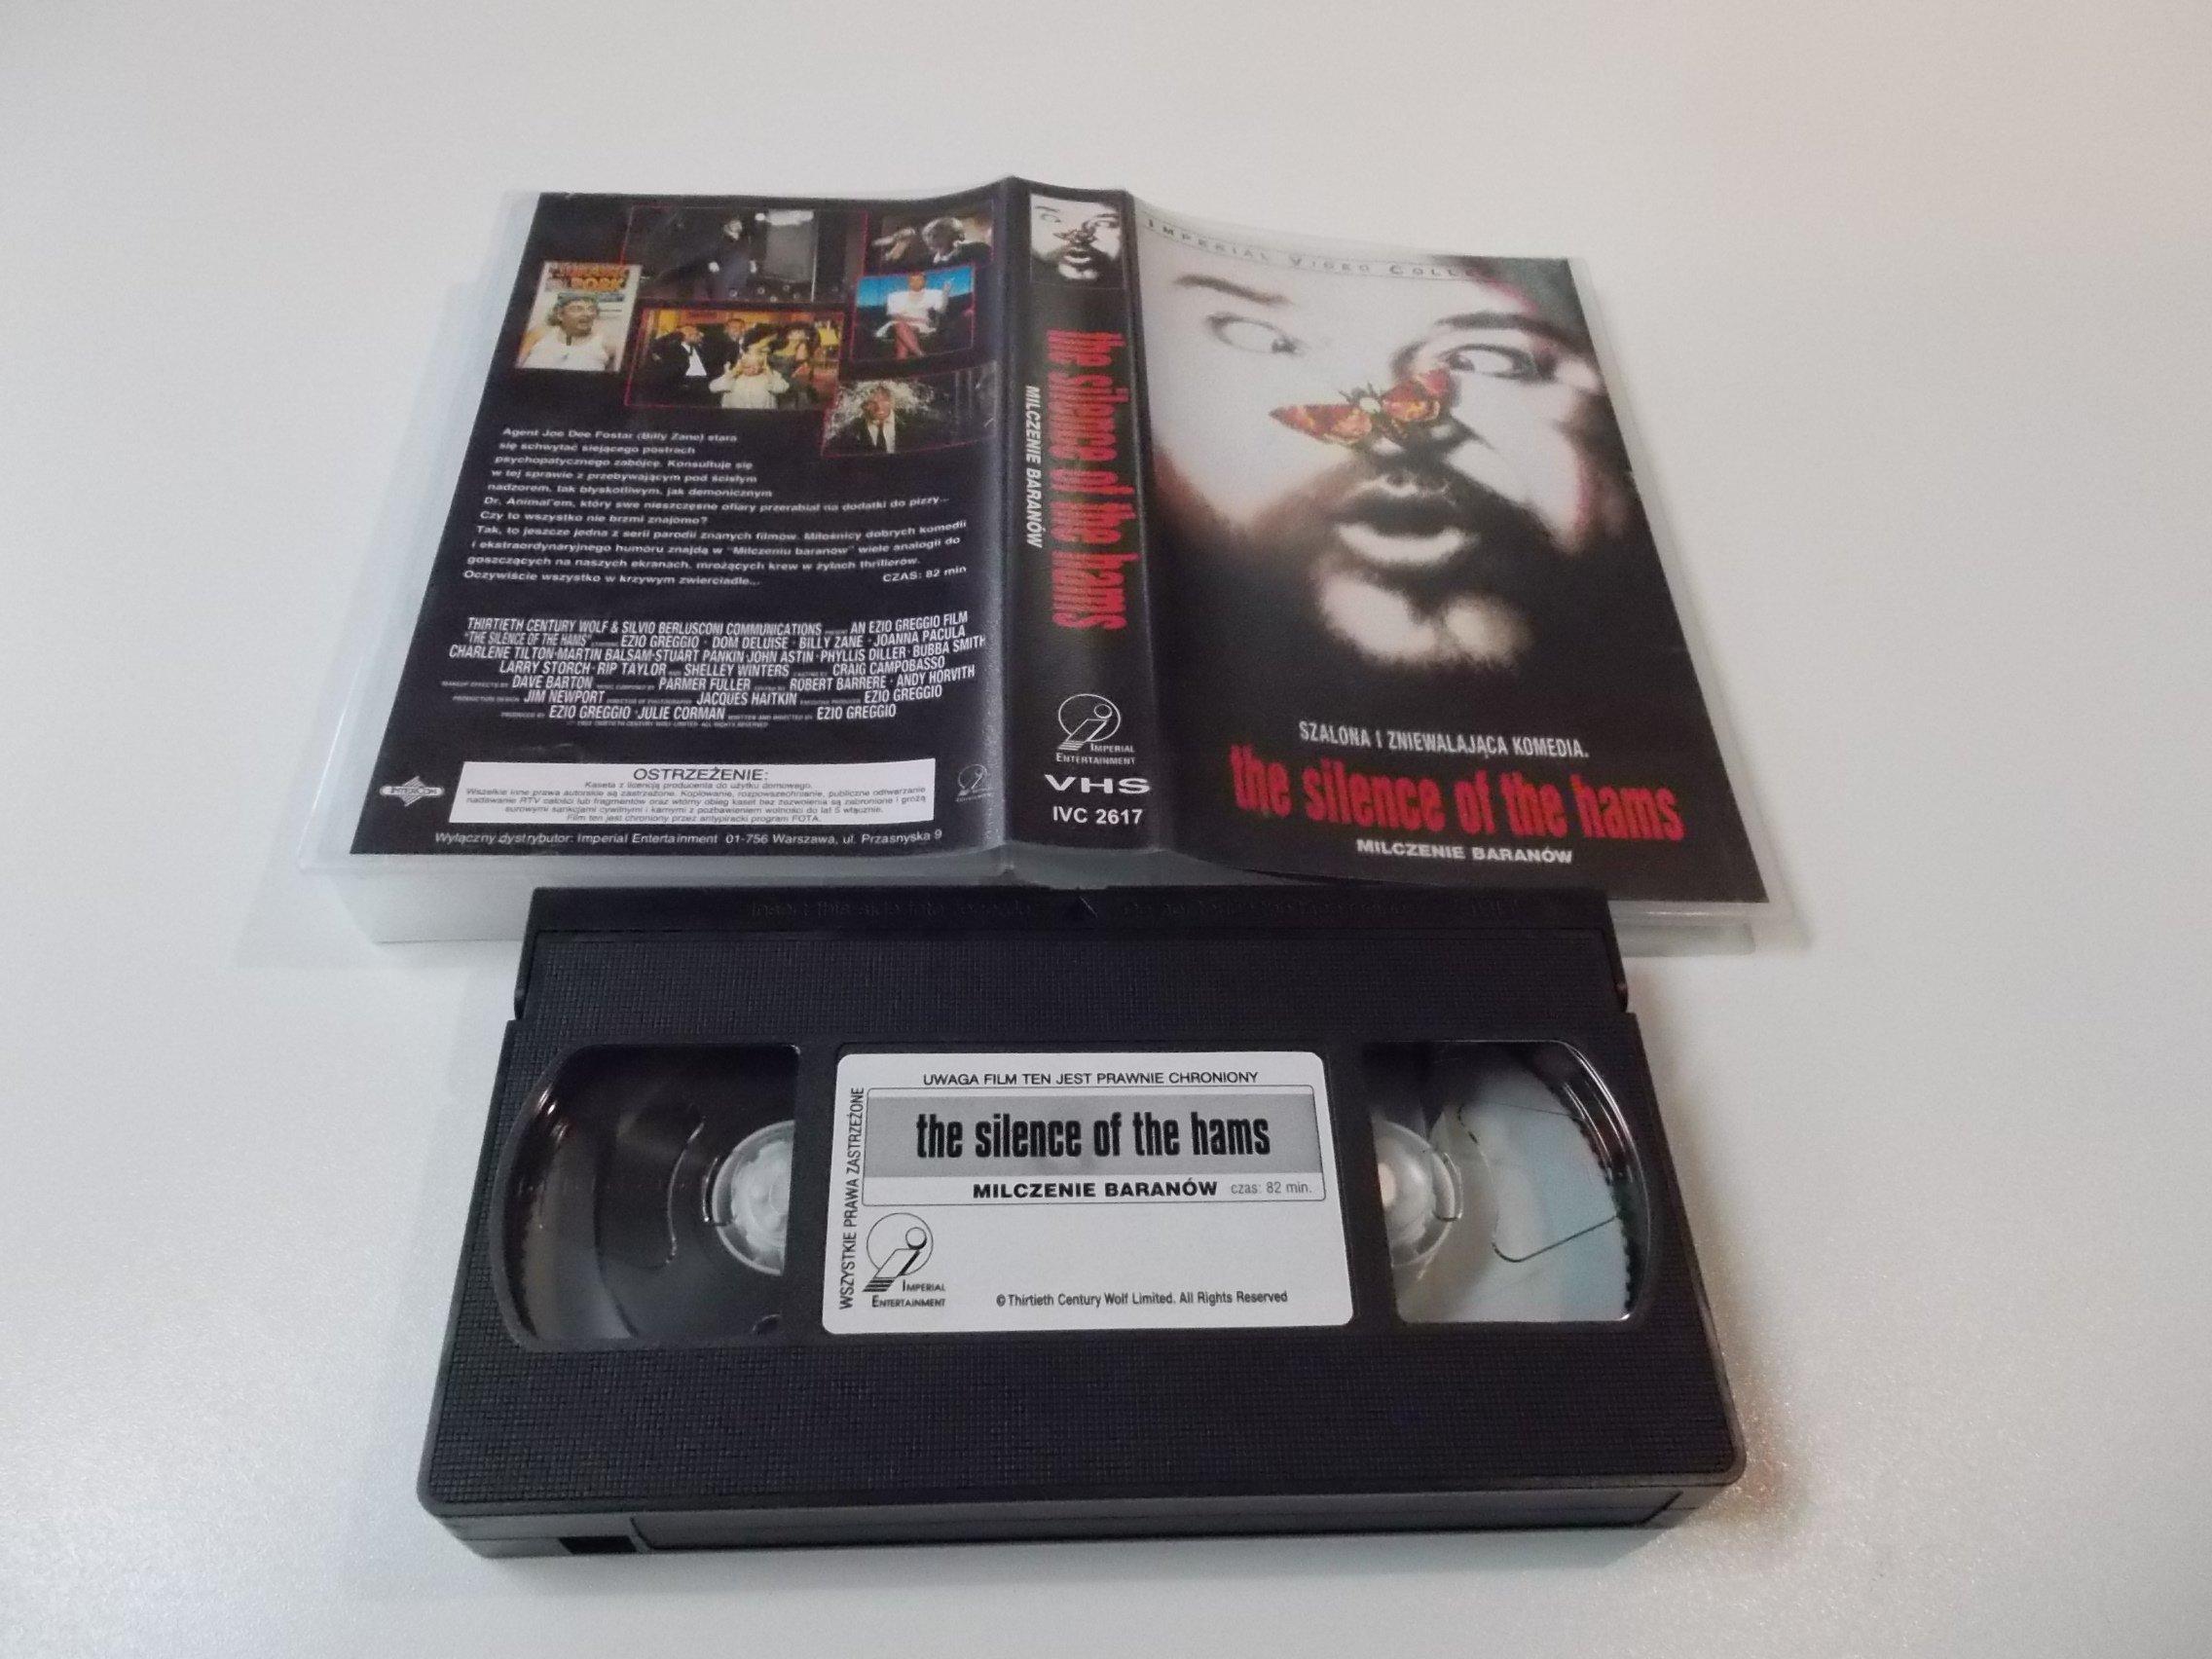 MILCZENIE BARANÓW - Kaseta Video VHS - Opole 1558